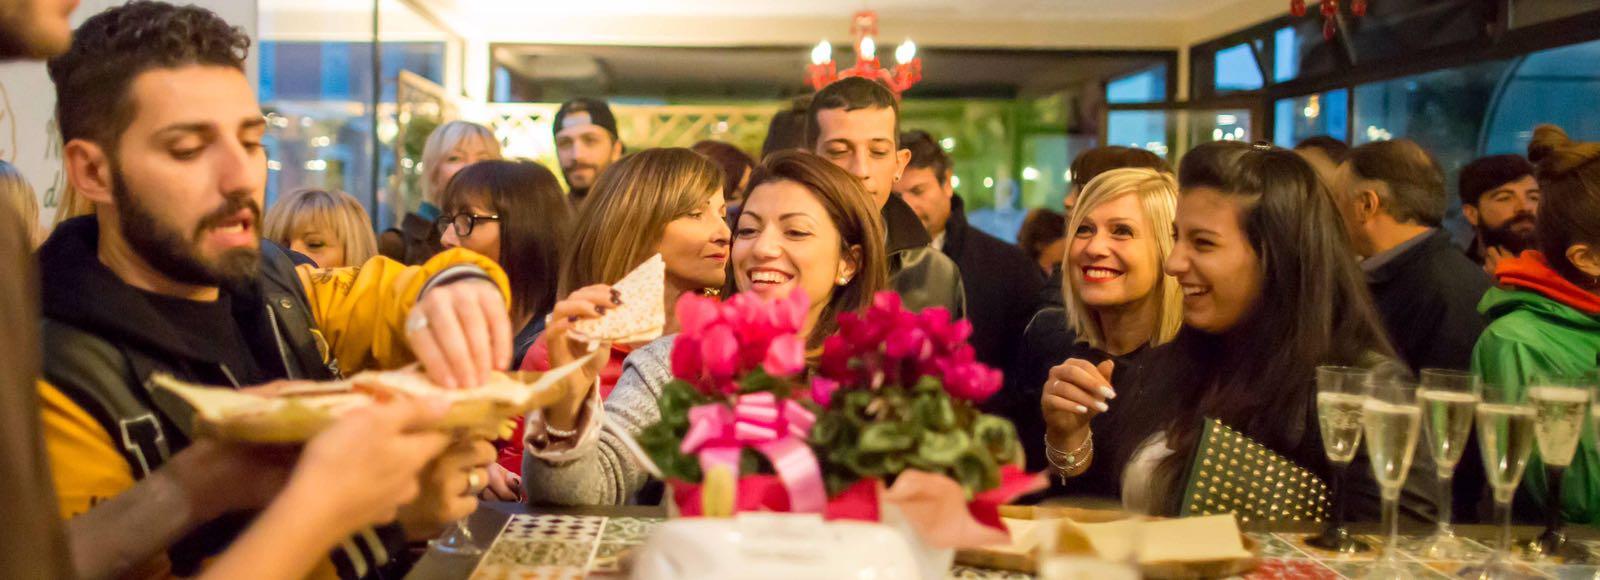 Una donna seduta al tavolo di Piada Mia mangia una piadina sorridendo